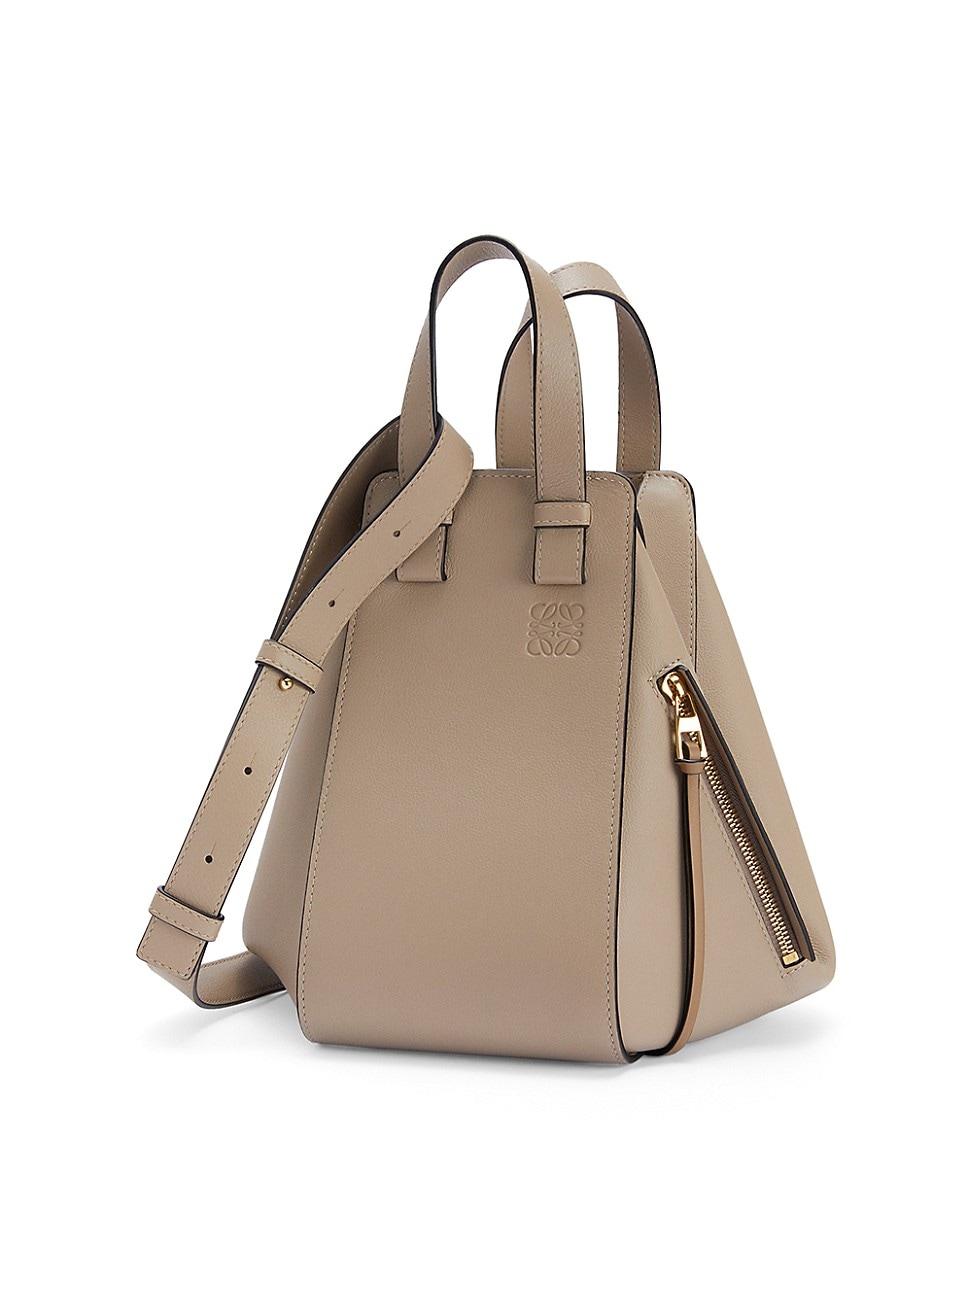 Loewe WOMEN'S SMALL HAMMOCK LEATHER BAG